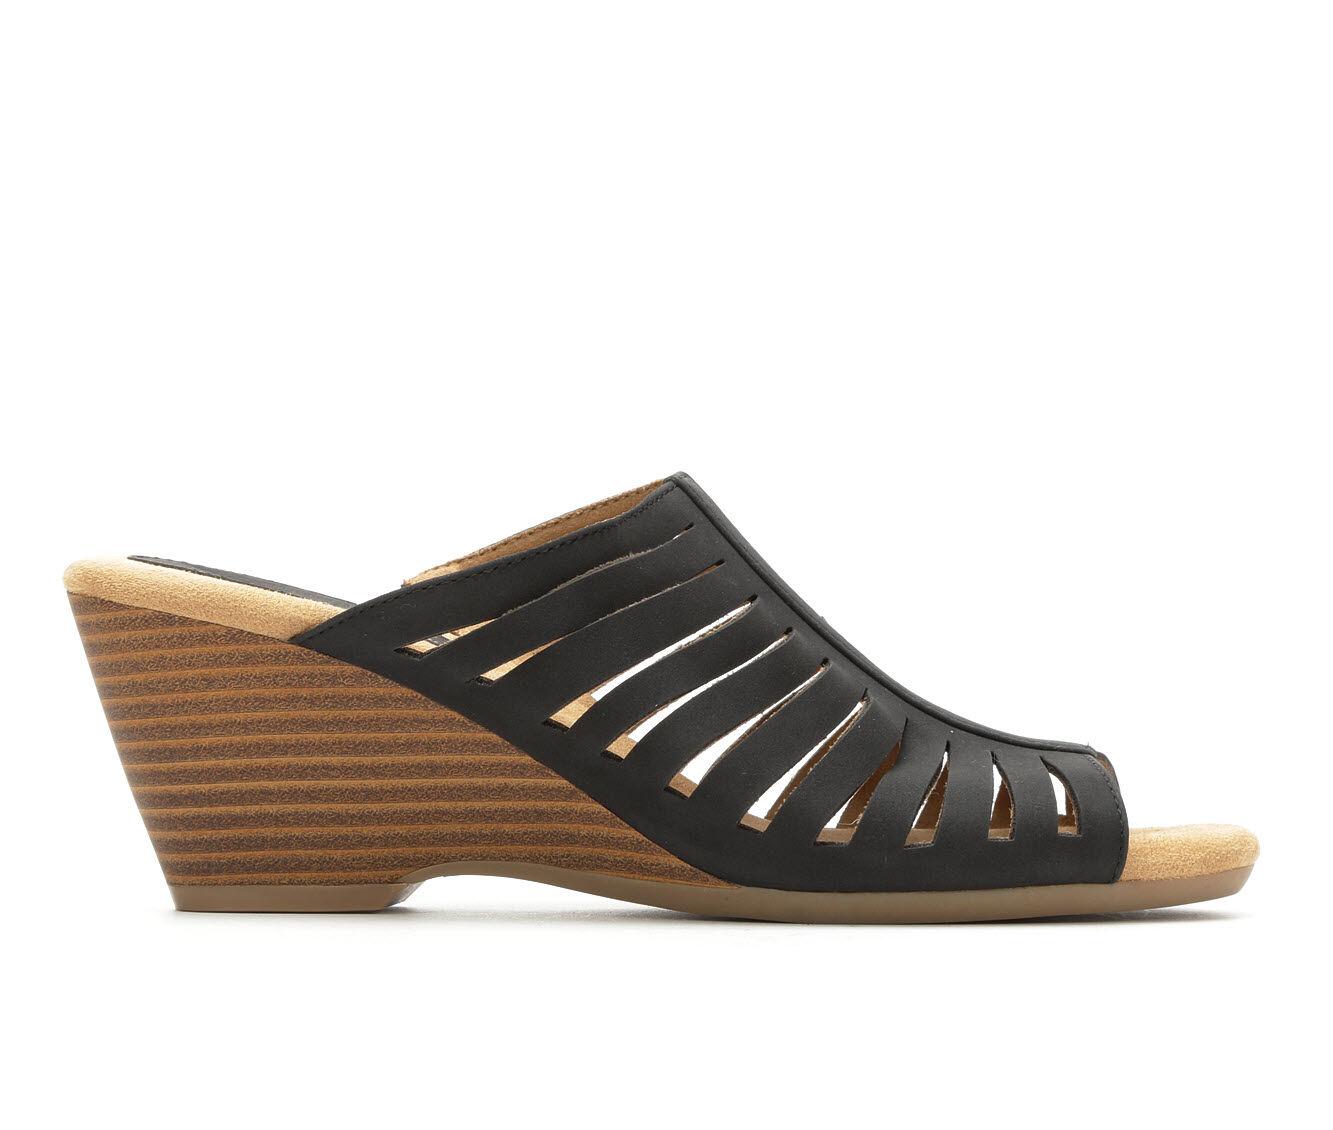 Sale Low Price Women's Solanz Paige Wedge Sandals Black